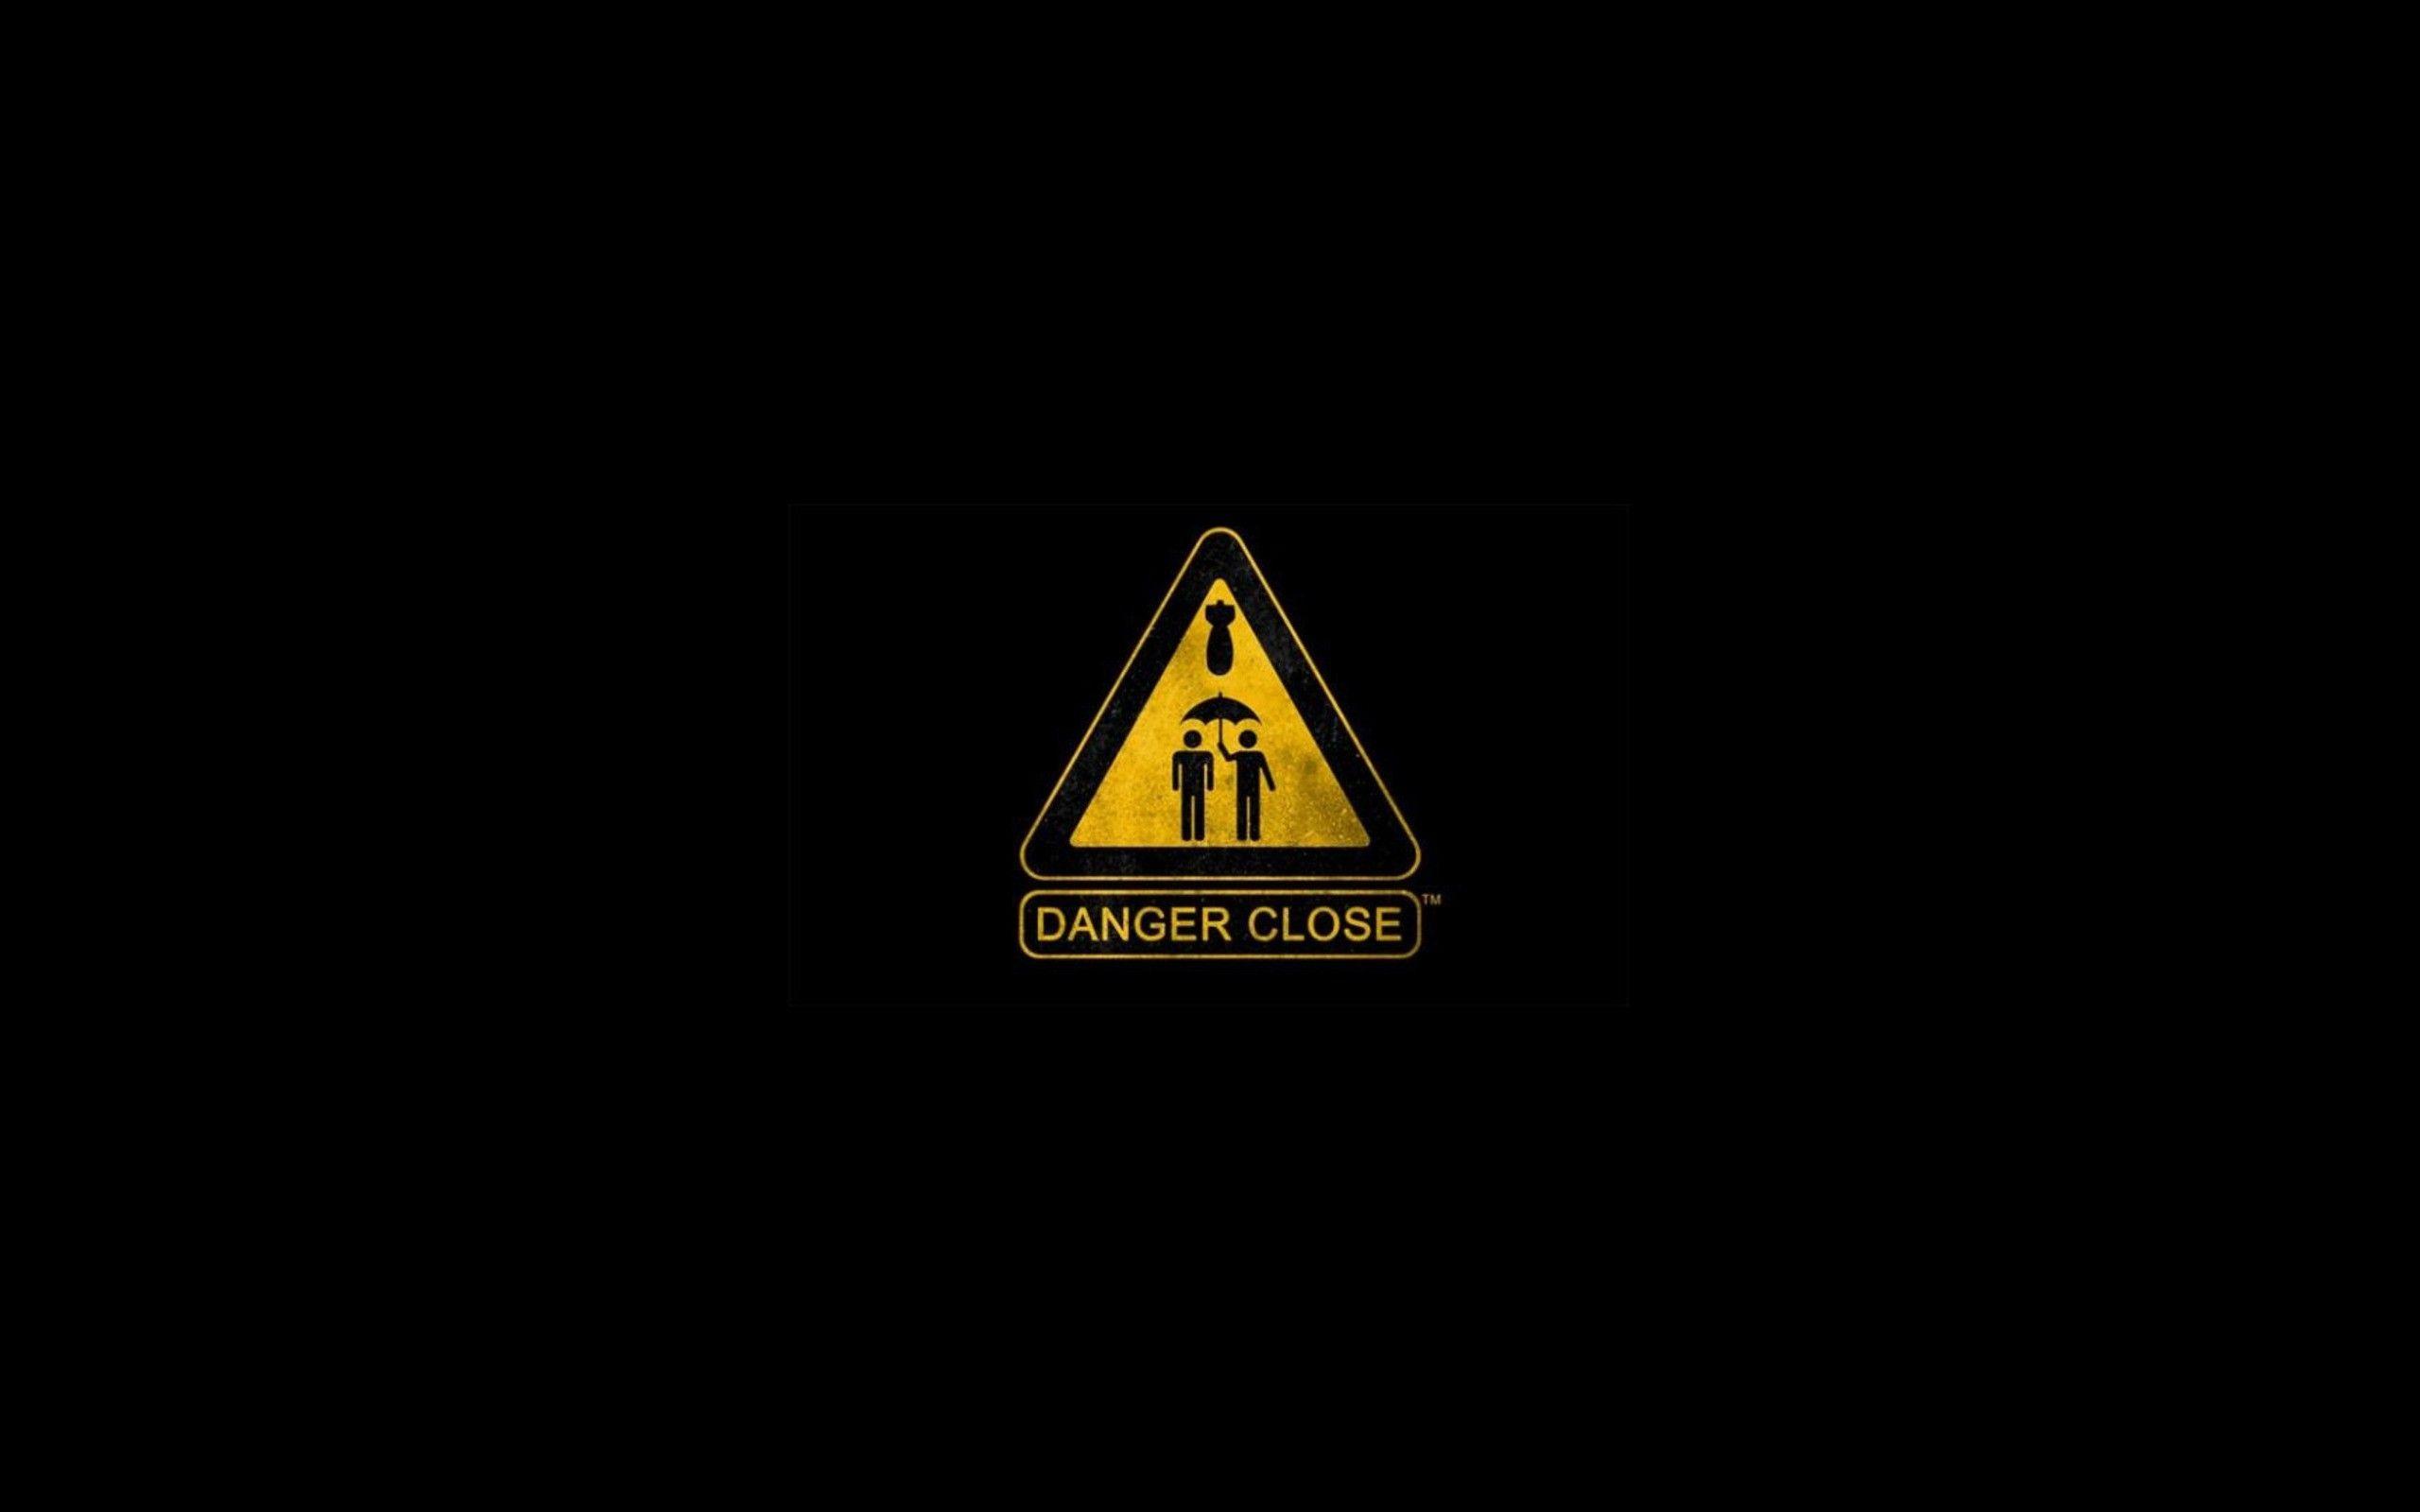 Tumblr nền nguy hiểm 2560x1600